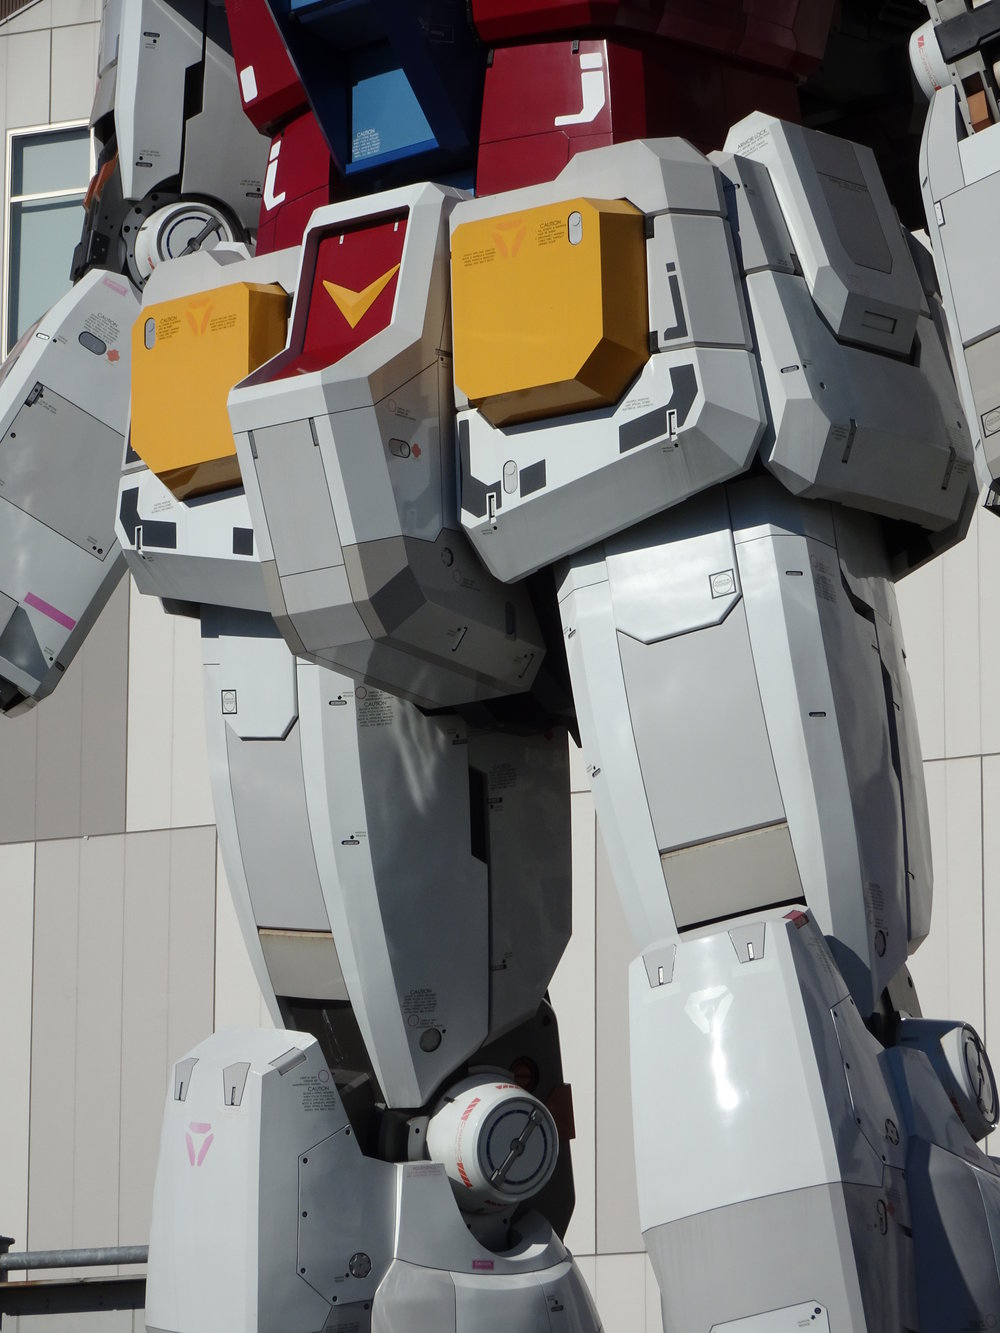 RX-78-2 Gundam 1-1 Statue - 008.jpg